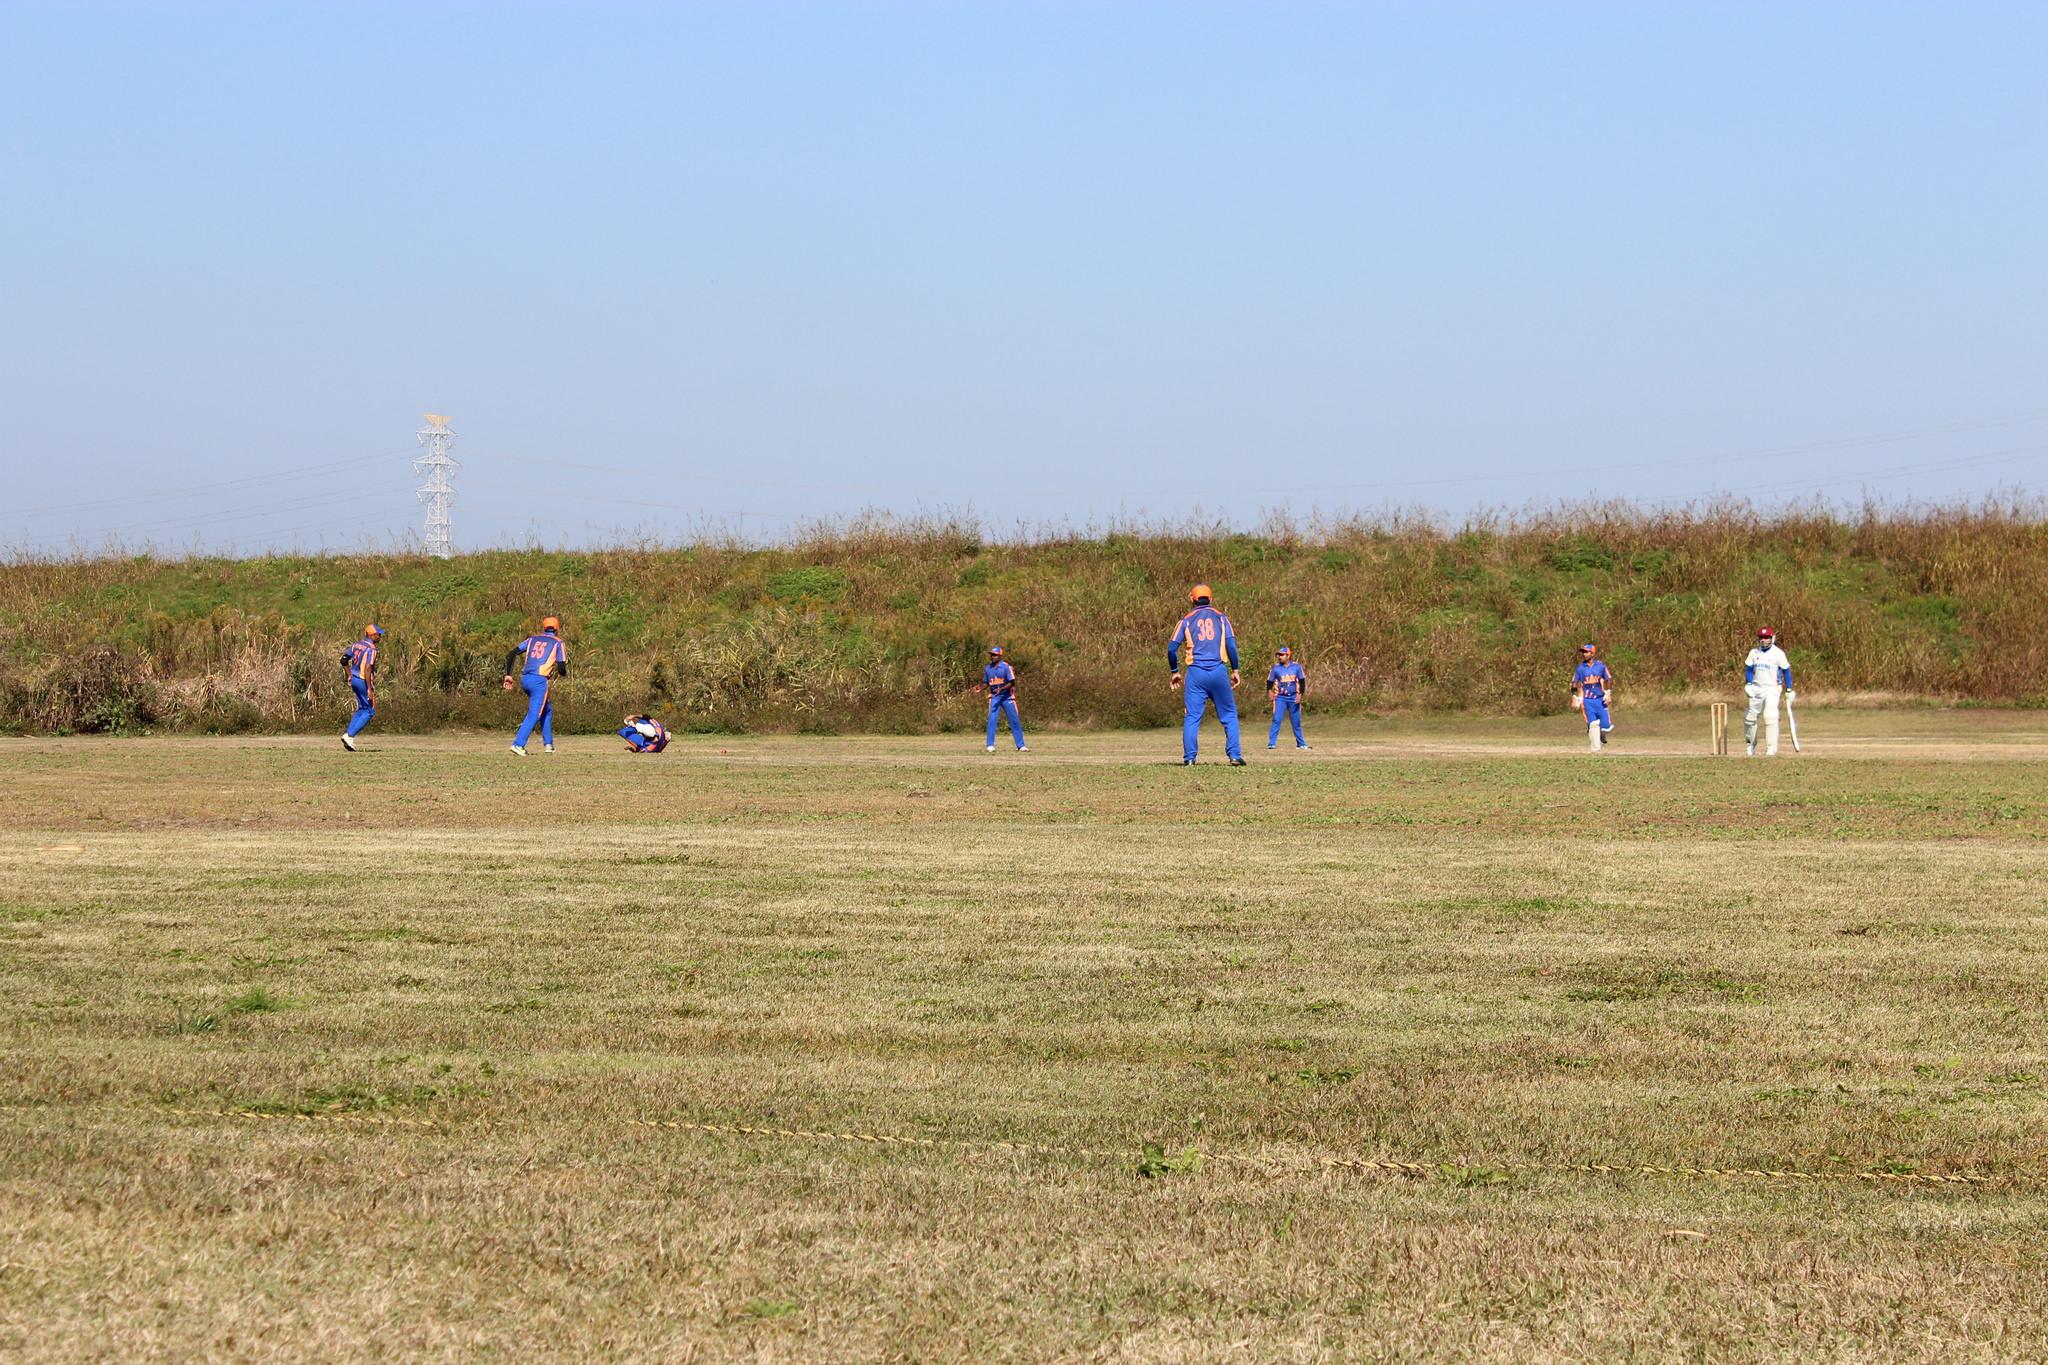 kcl-final-team-photo_1